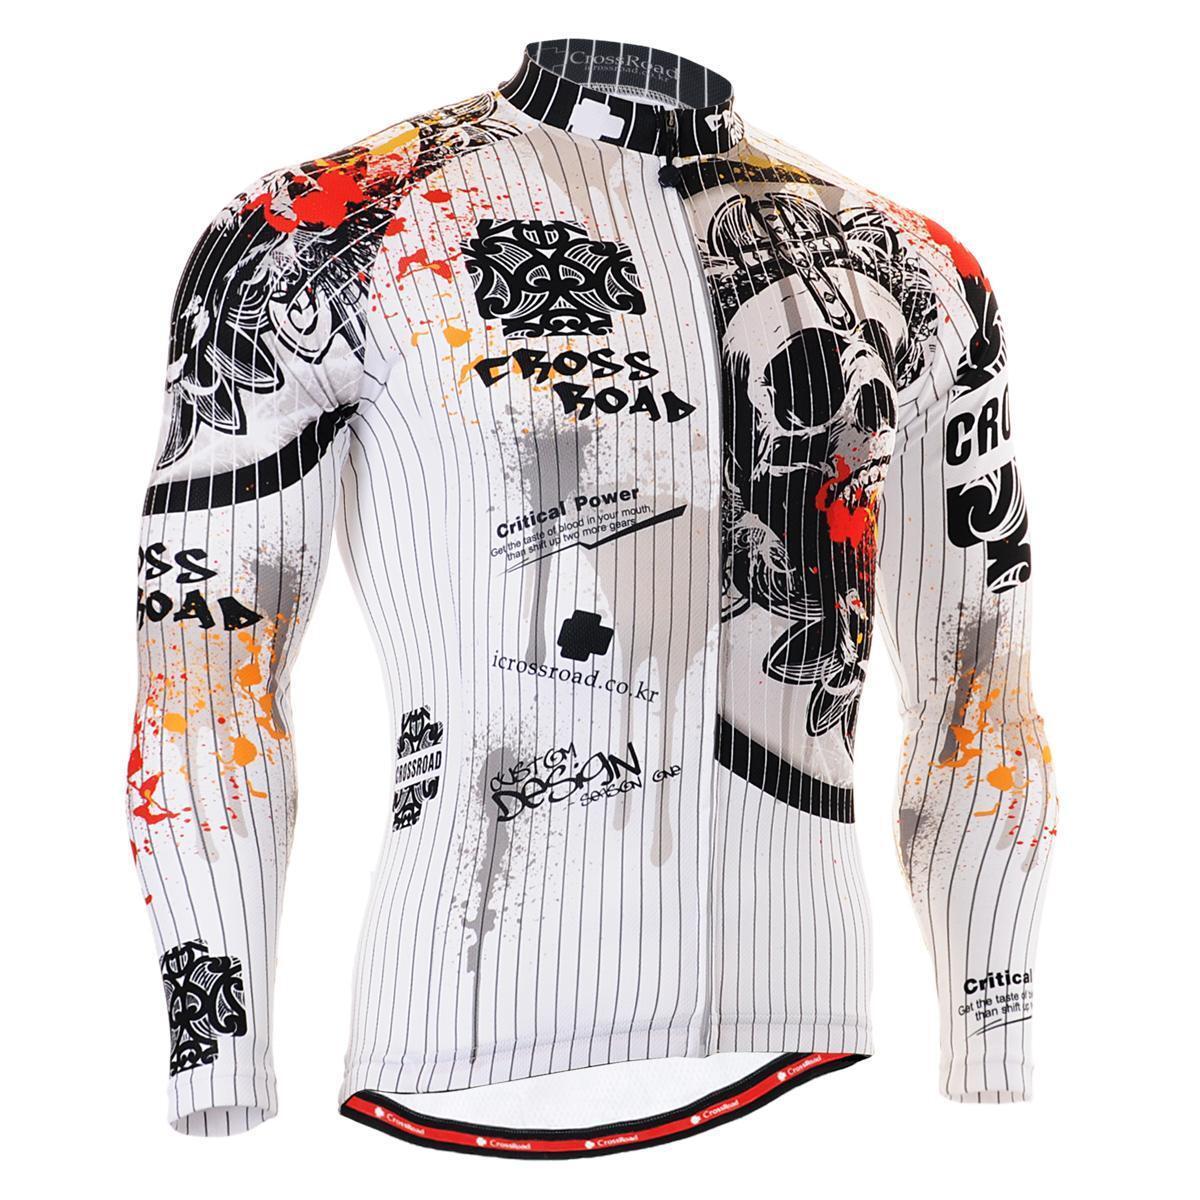 FIXGEAR CS-901 Men's Long Sleeve Cycling Jersey  Bicycle Apparel Roadbike MTB  order online